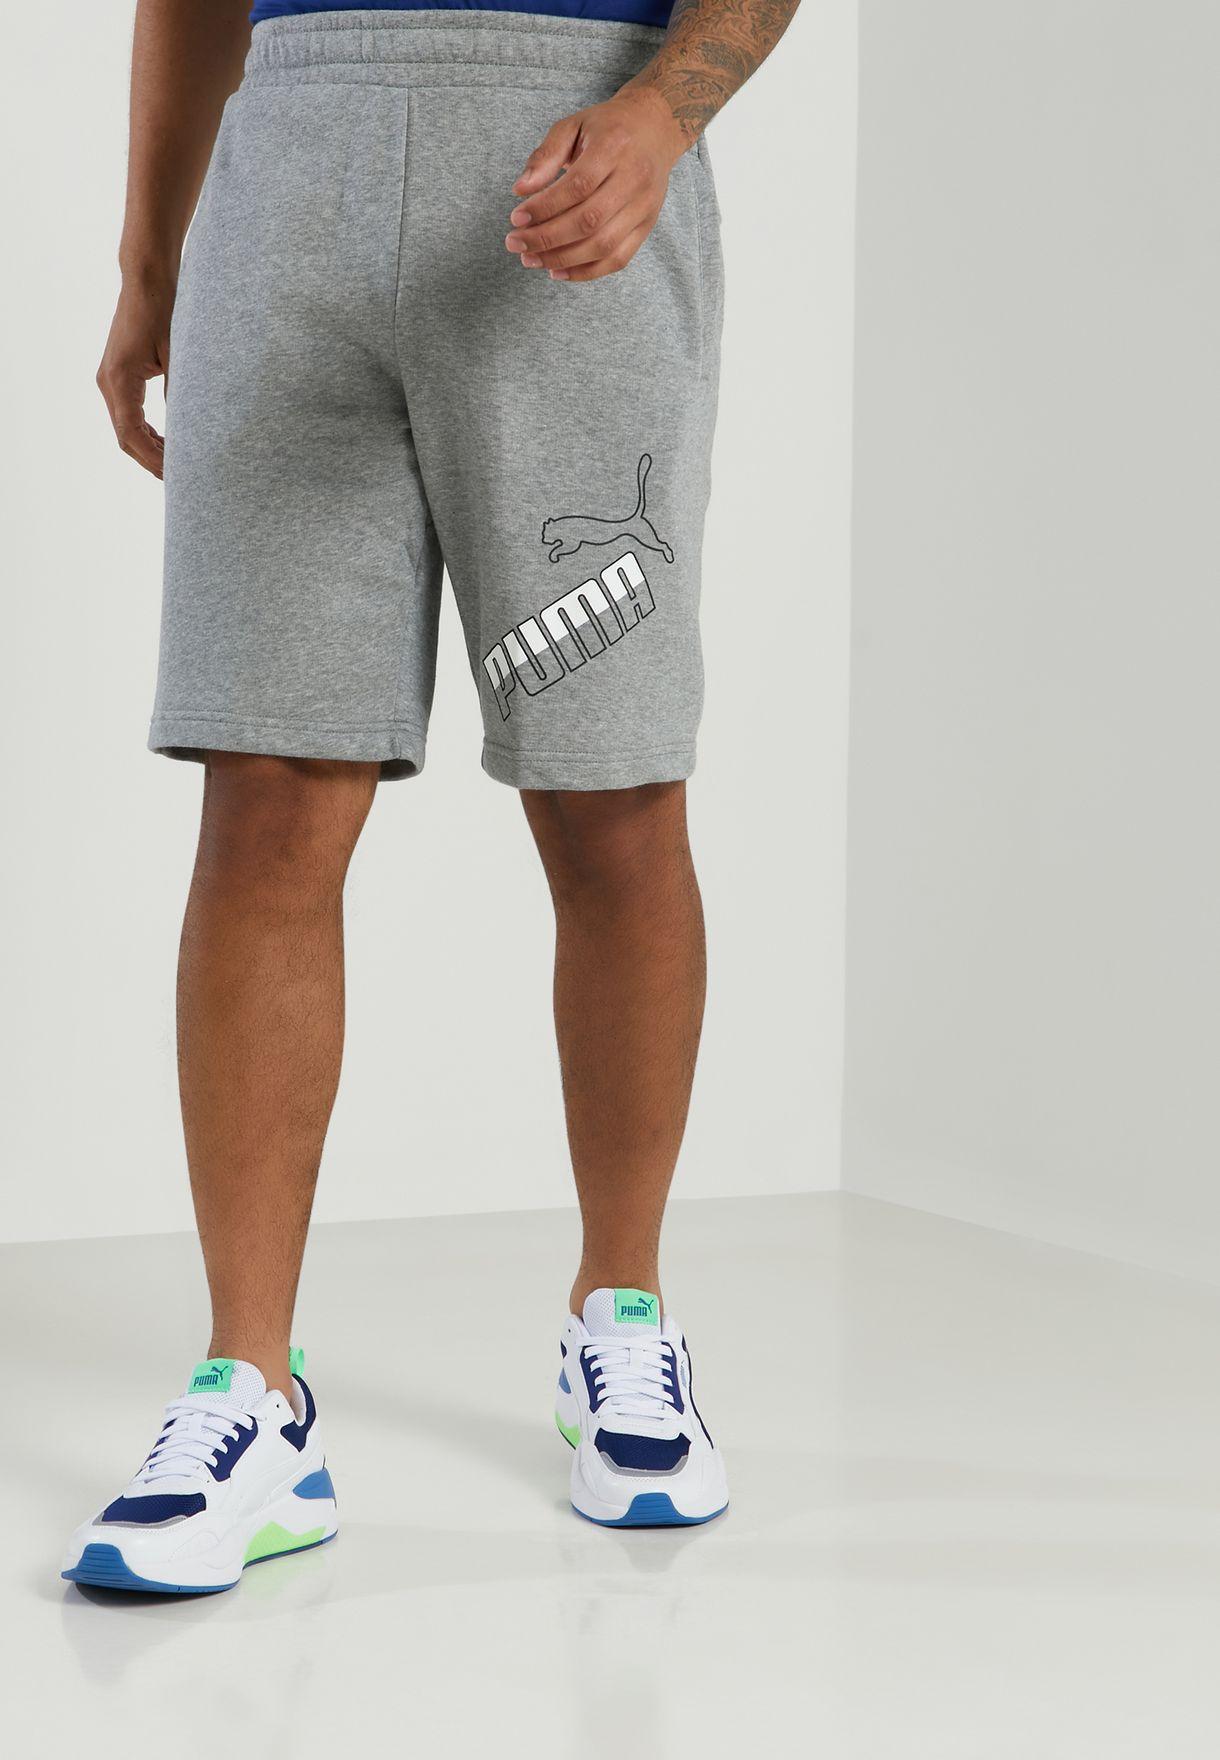 BIG LOGO men shorts